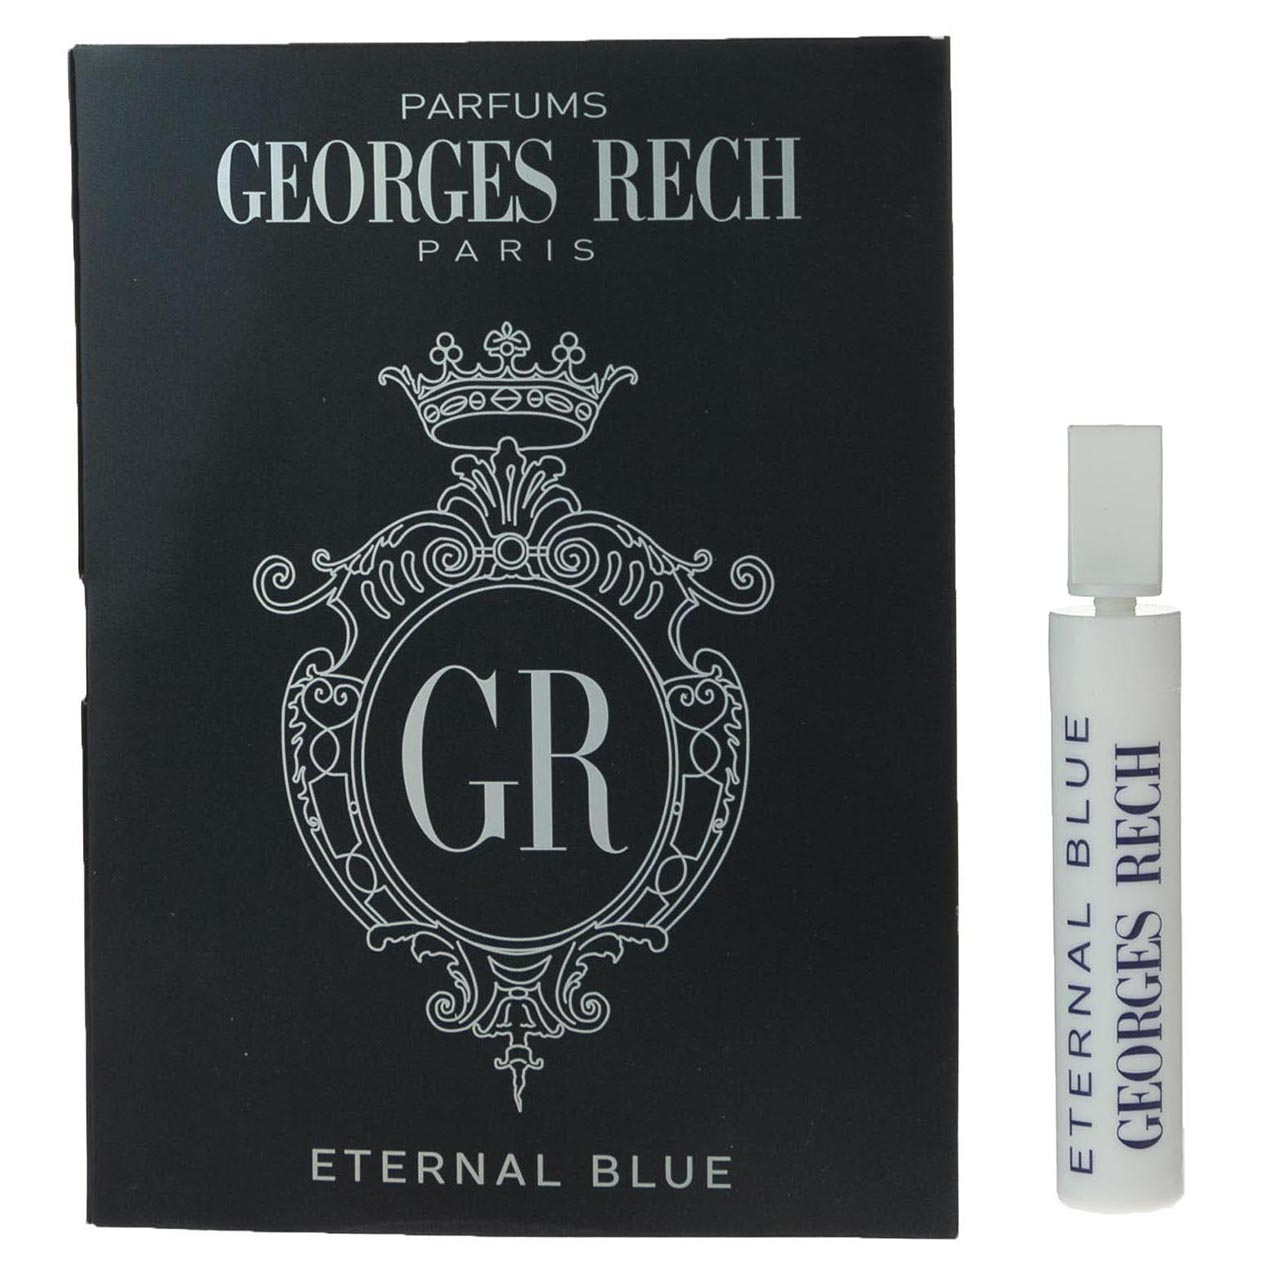 تستر ادو تویلت مردانه جورج رچ مدل Eternal Blue حجم 1 میلی لیتر